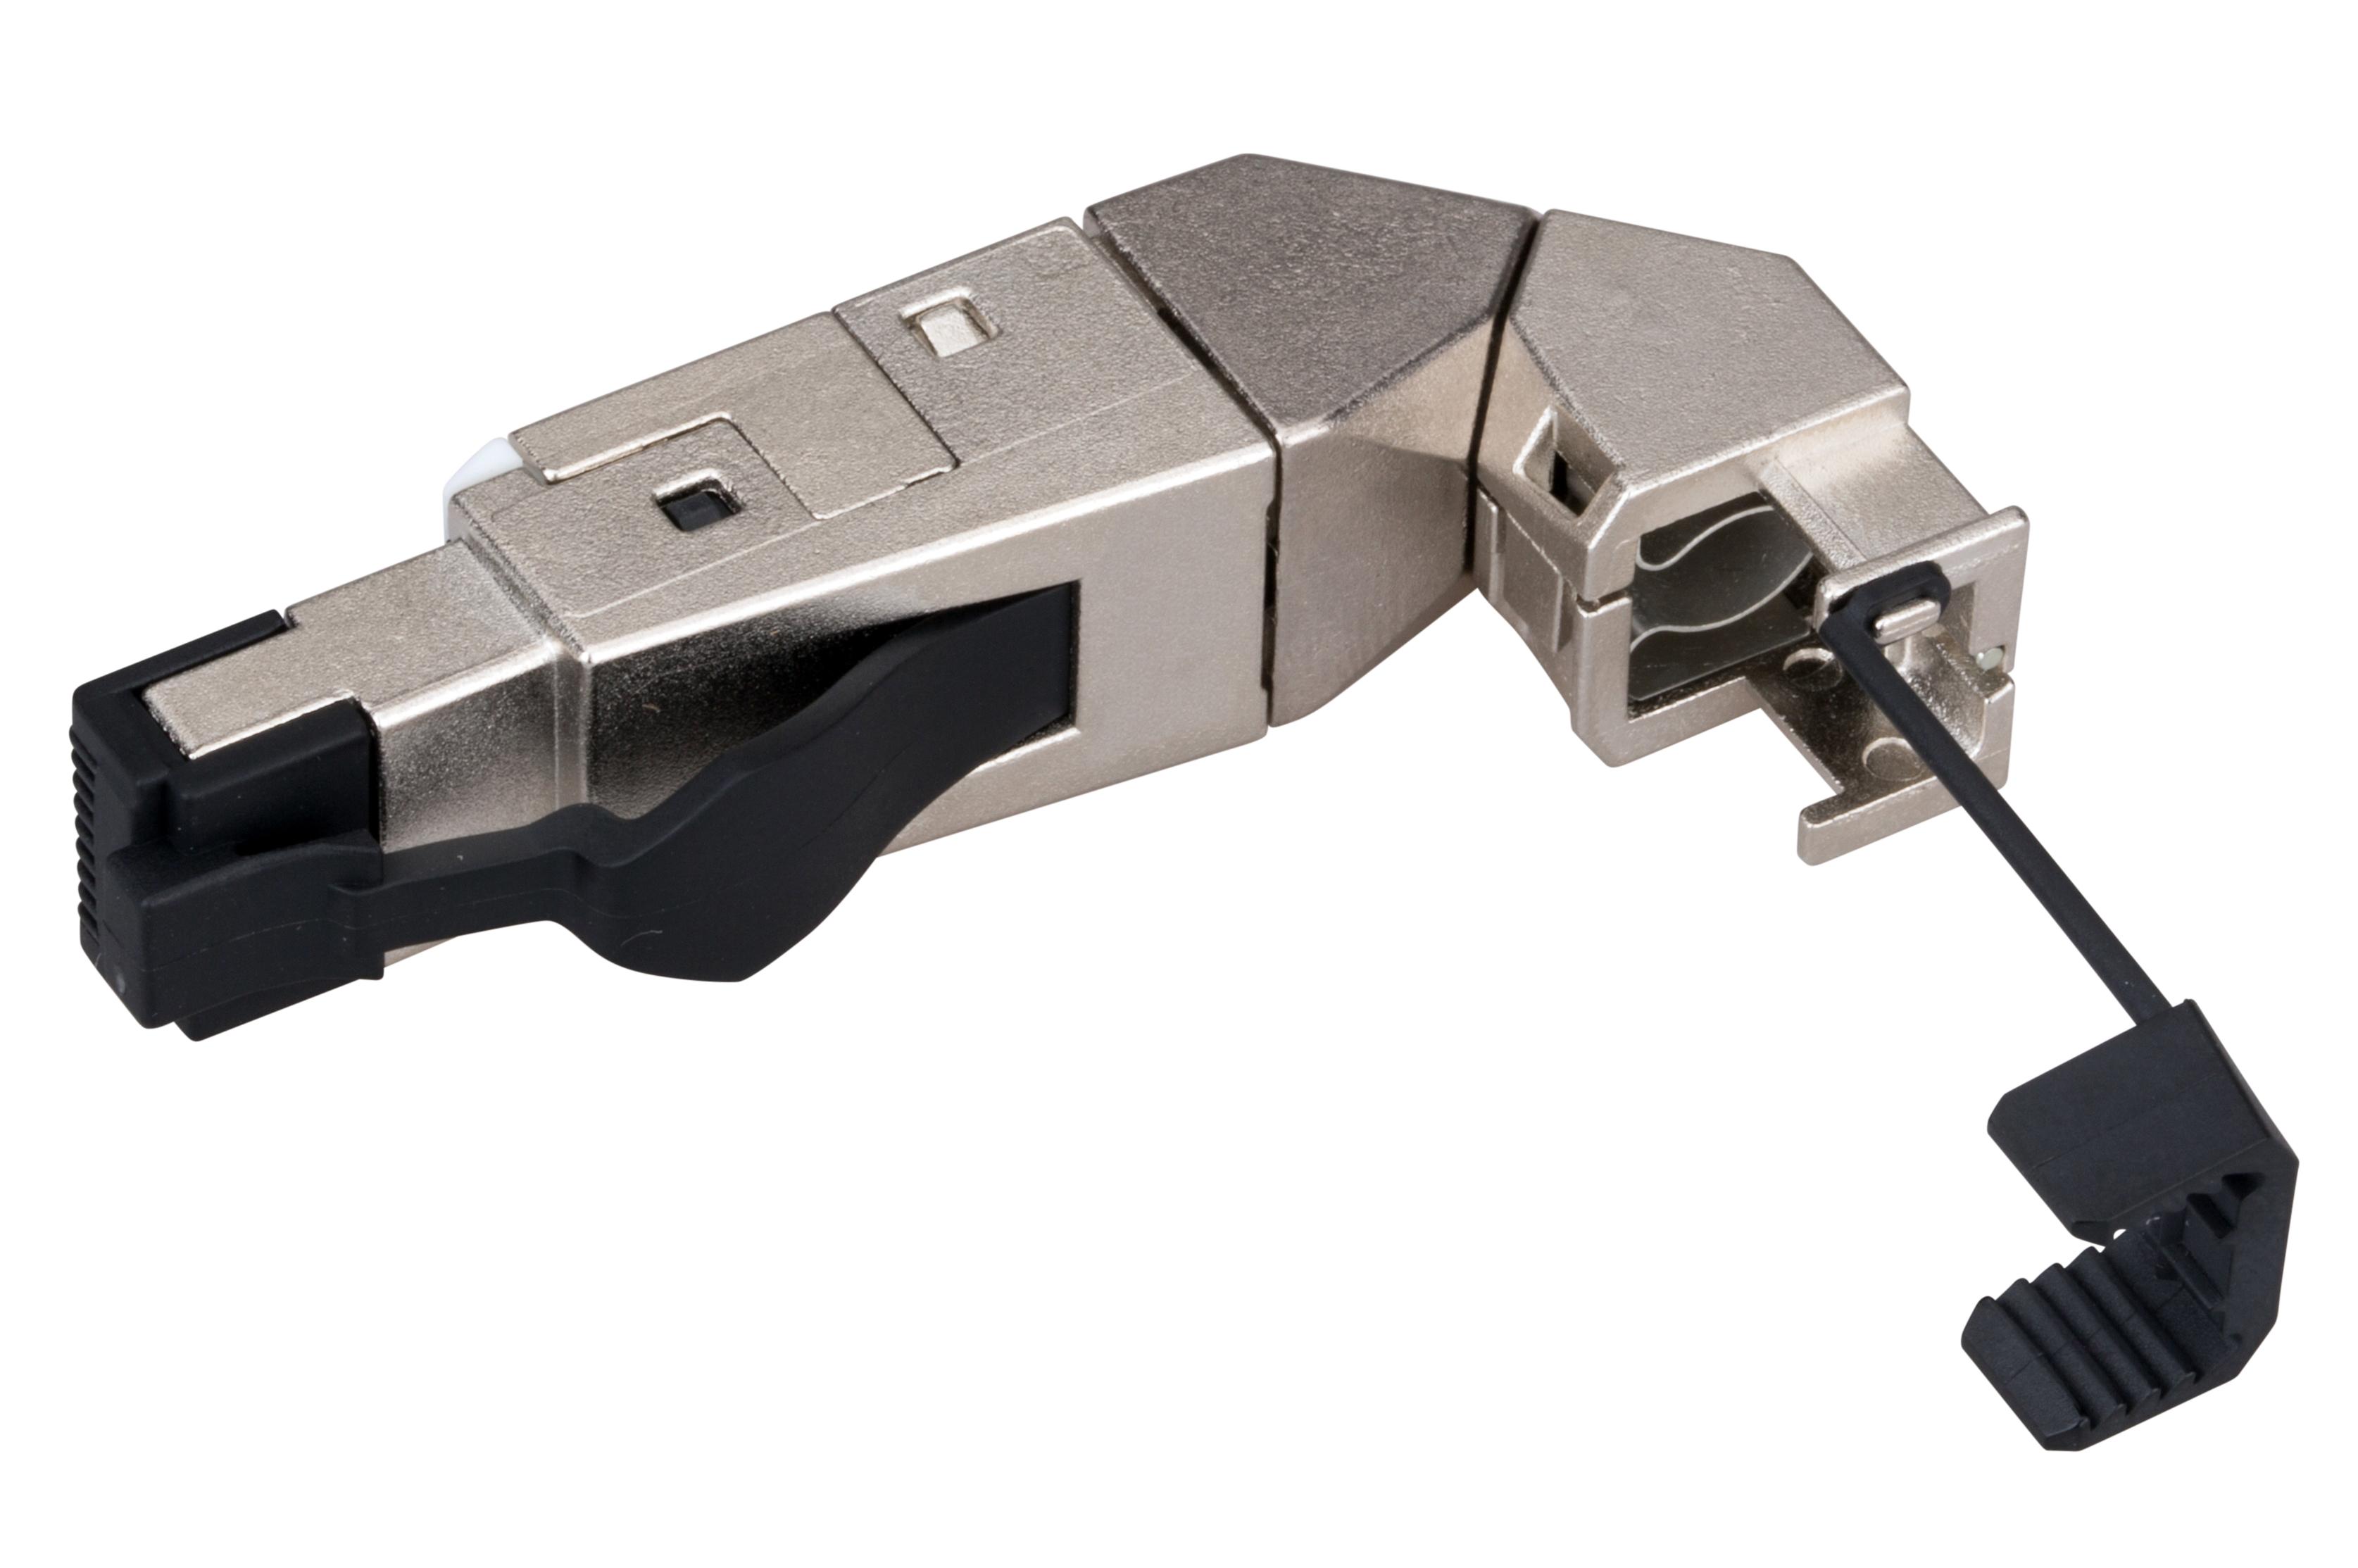 1 Stk Feldkonfektionierbarer RJ45 Ind.-Stecker gesch.Cat.6a,Winkel HSISR6SI3W